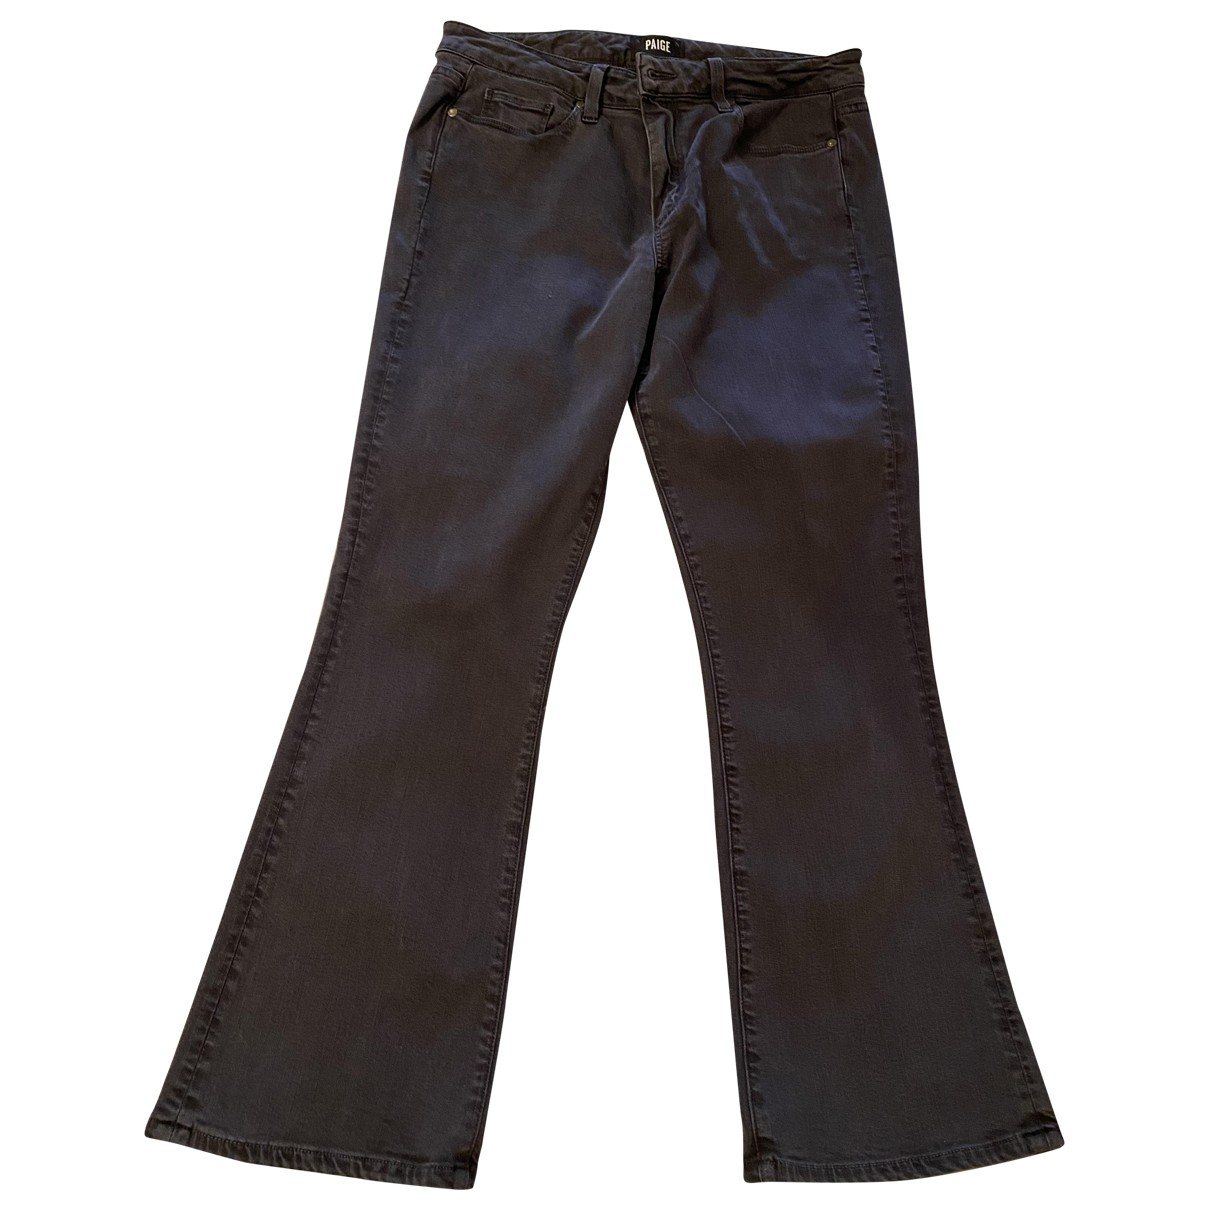 Paige Jeans N Navy Denim - Jeans Jeans for Women 31 US